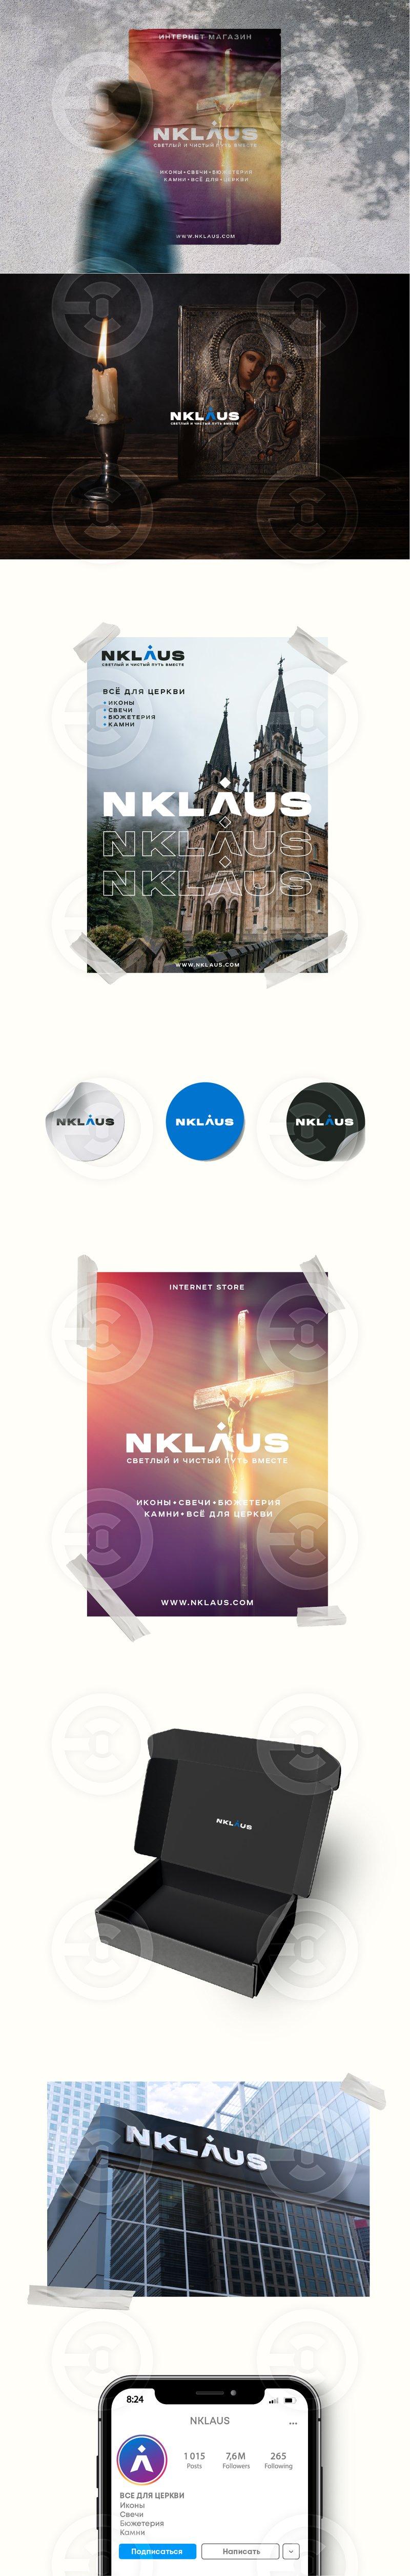 NKLAUS – работа в портфолио фрилансера